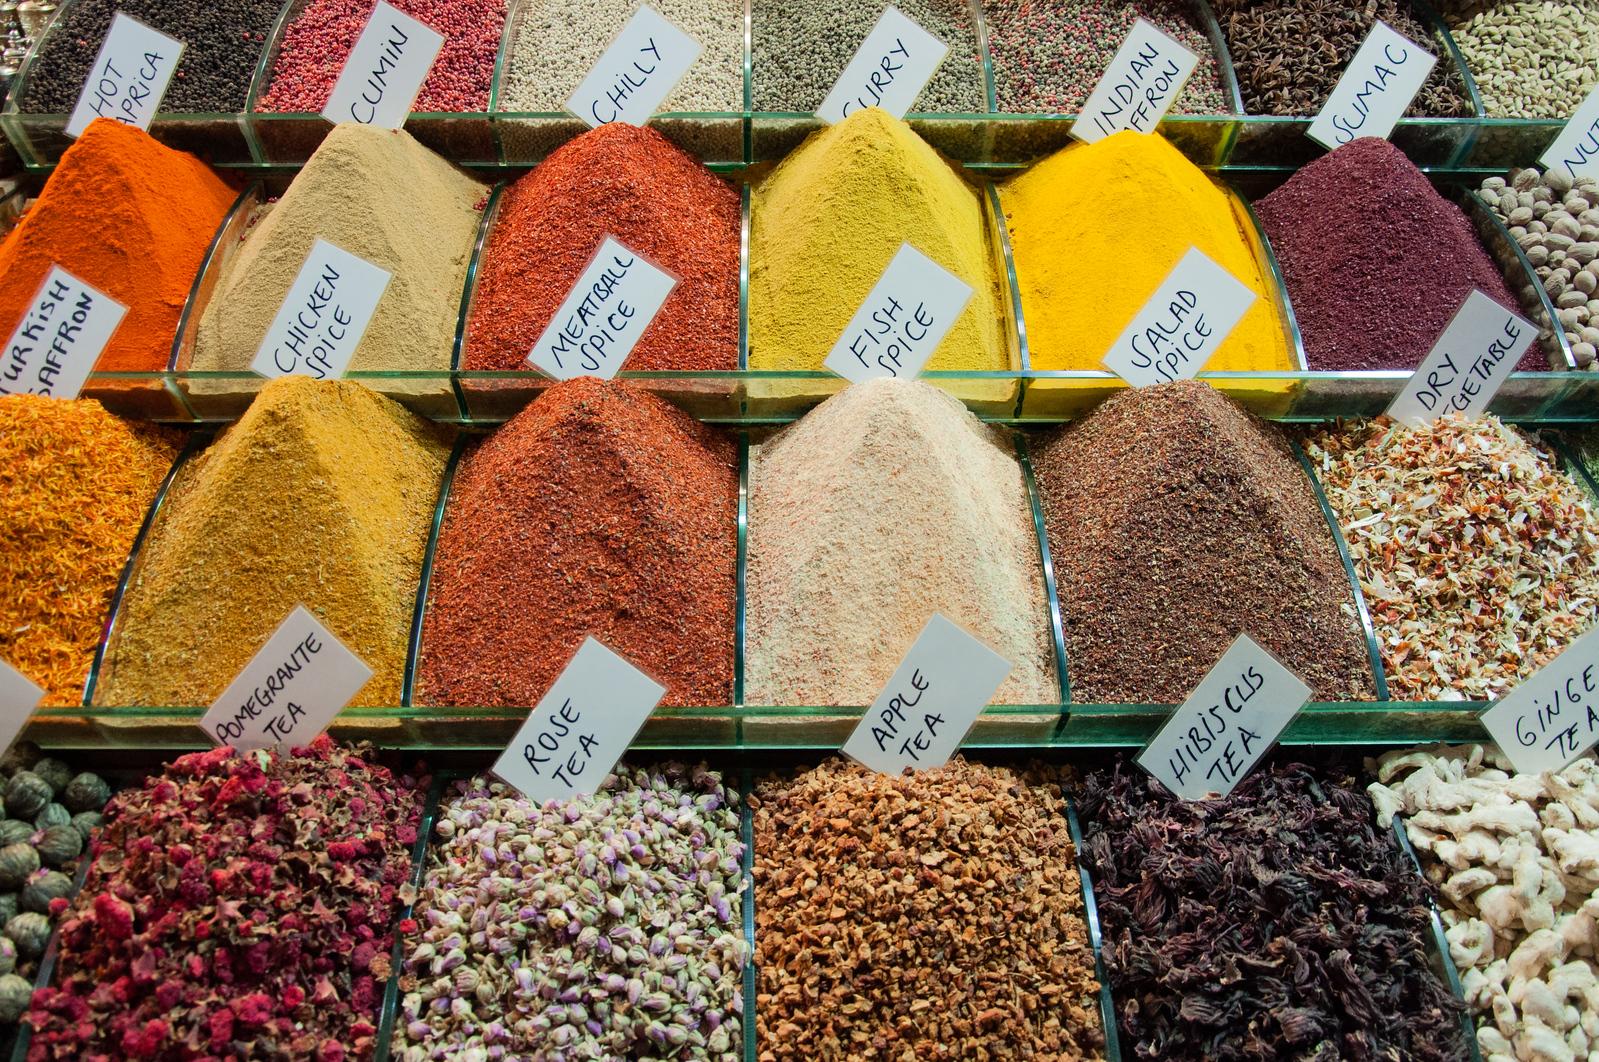 The Spice Bazaar in historic Istanbul, Turkey.